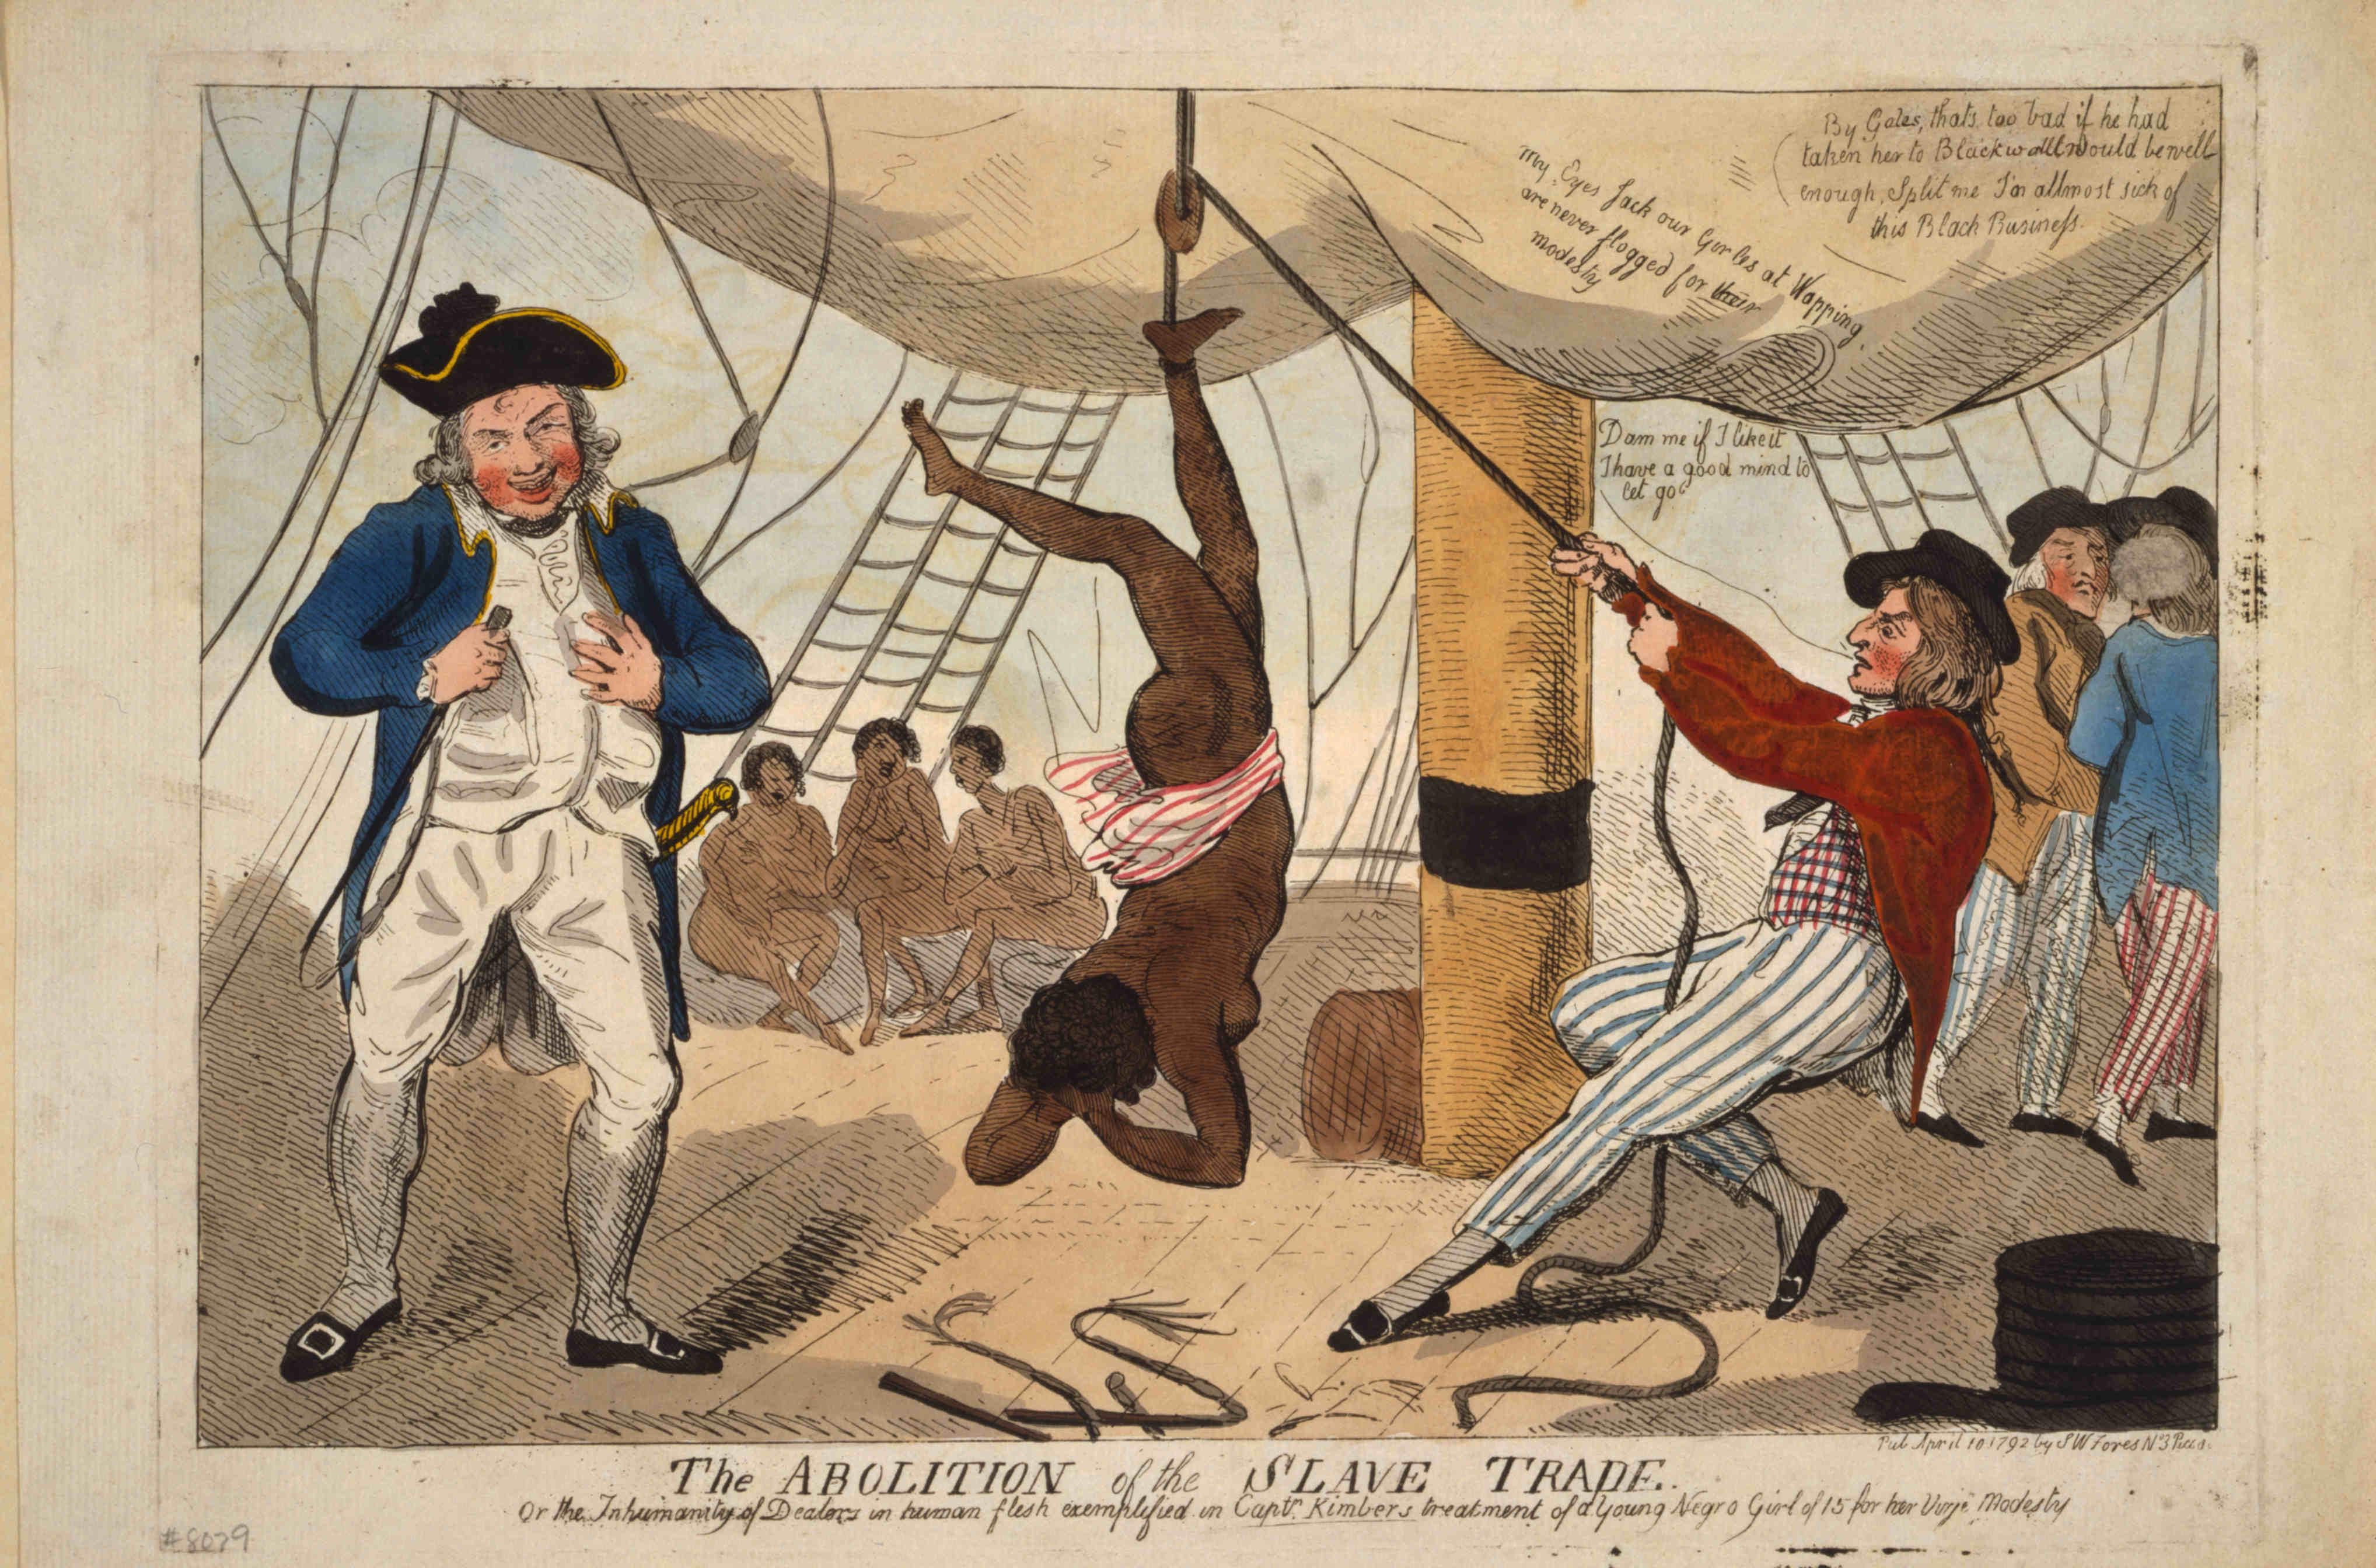 Ethics and slavery